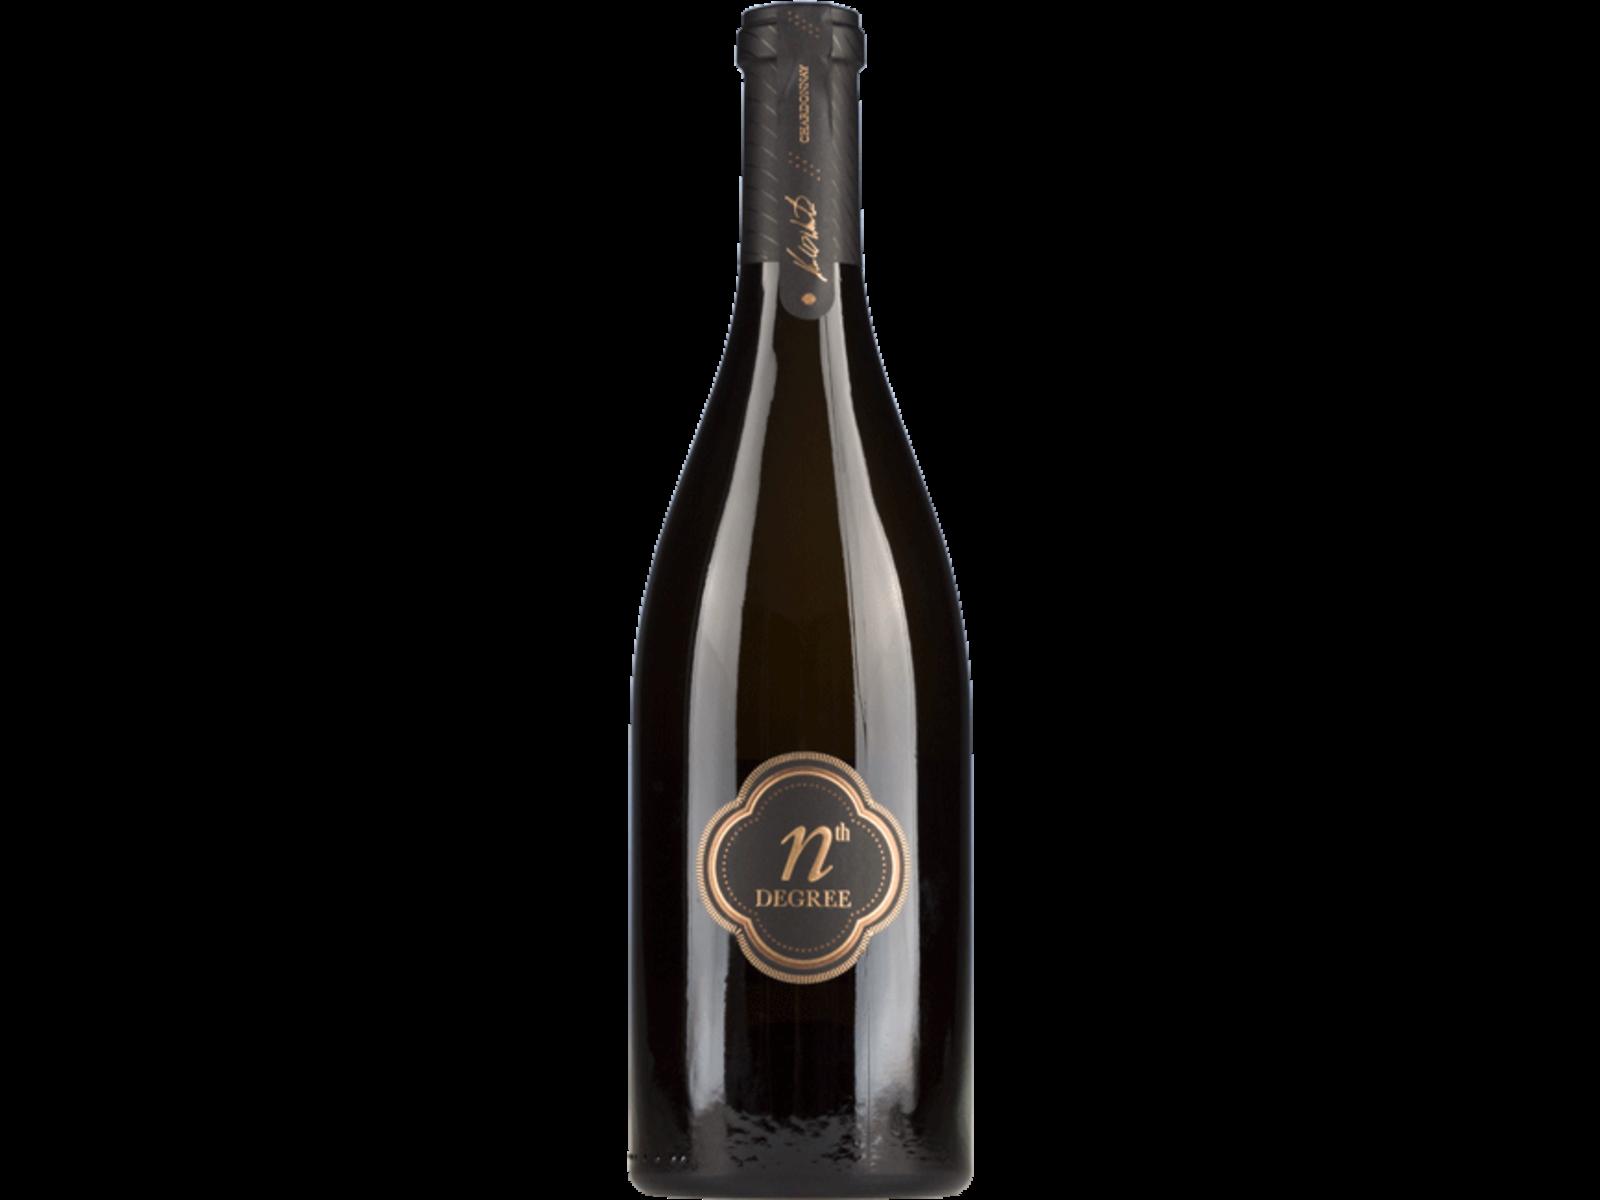 Wente Vineyards Wente Riva / Nth Degree / Chardonnay